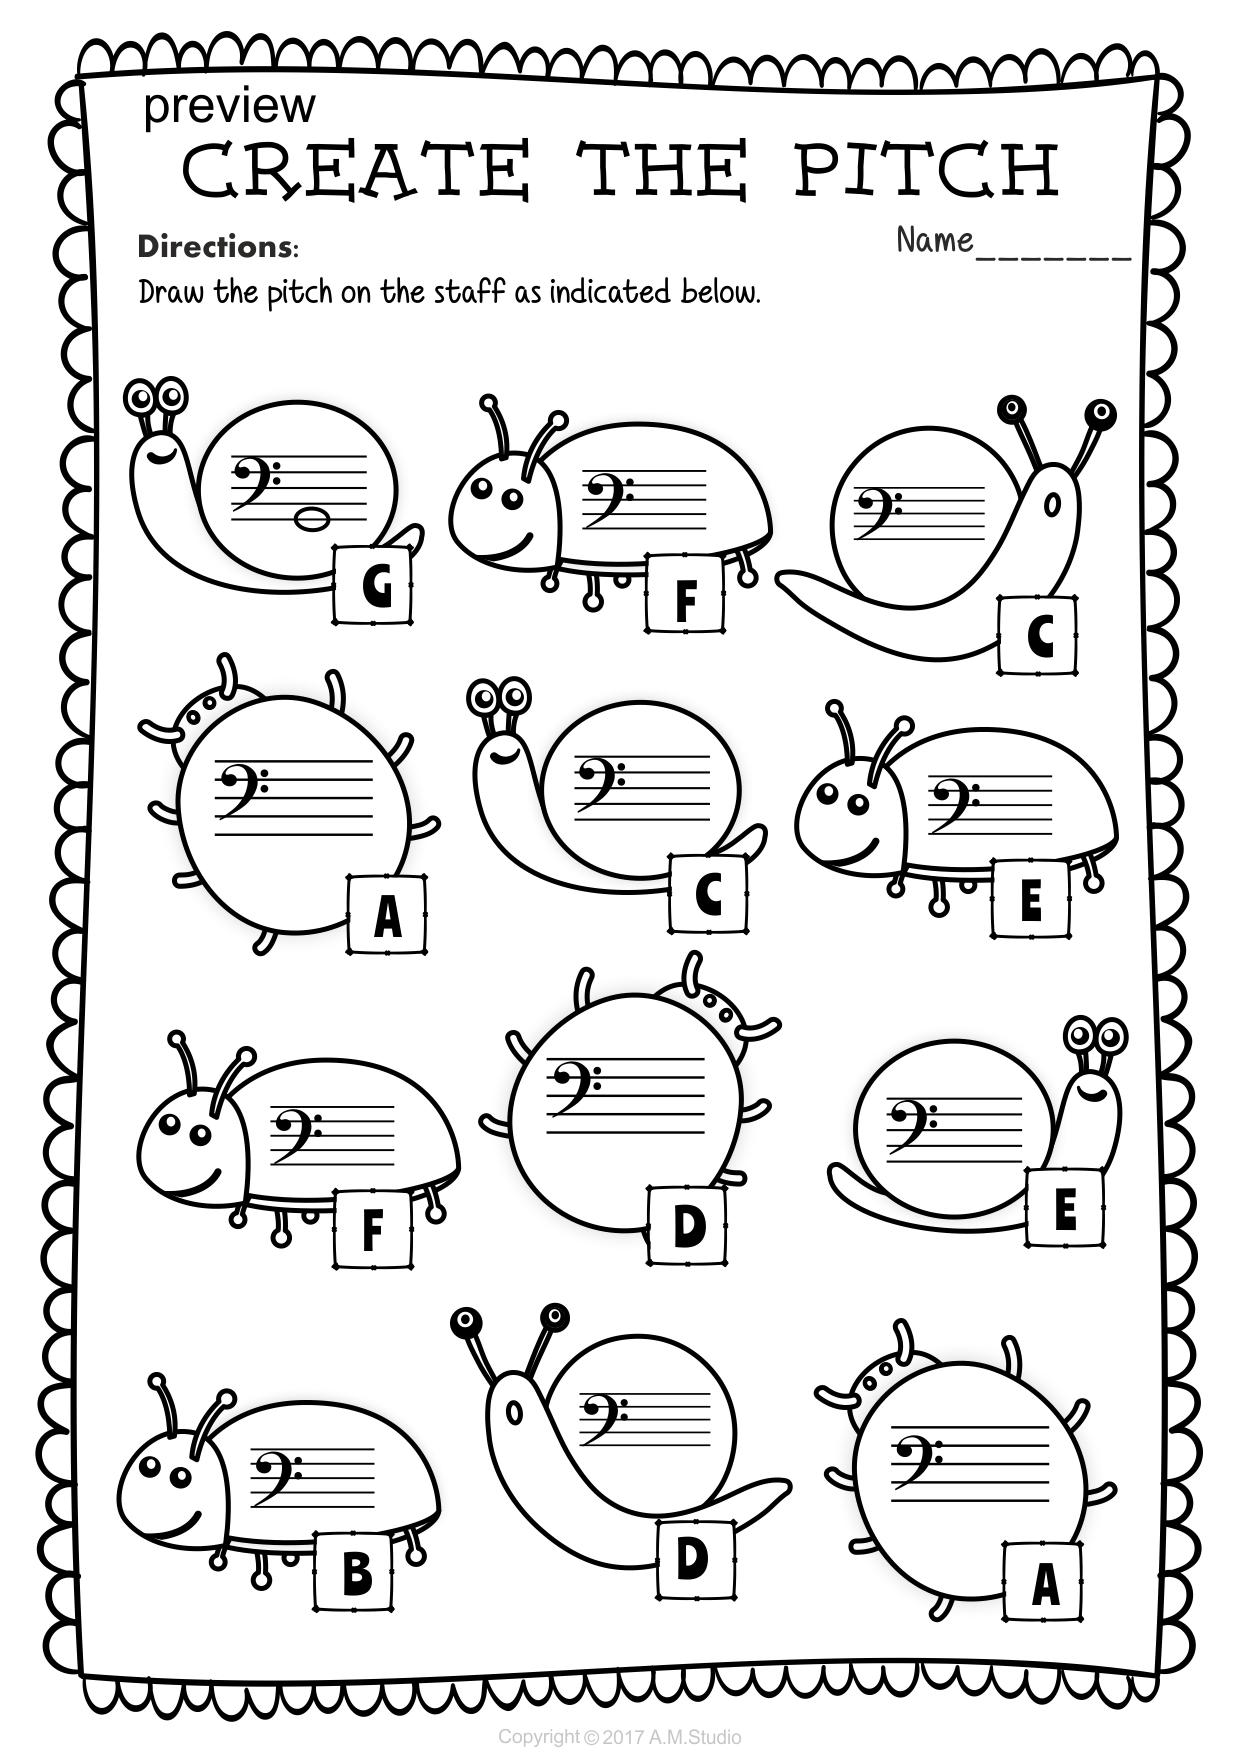 Worksheets Bass Clef Worksheets bass clef note naming worksheets for spring music anastasiya multimedia studio